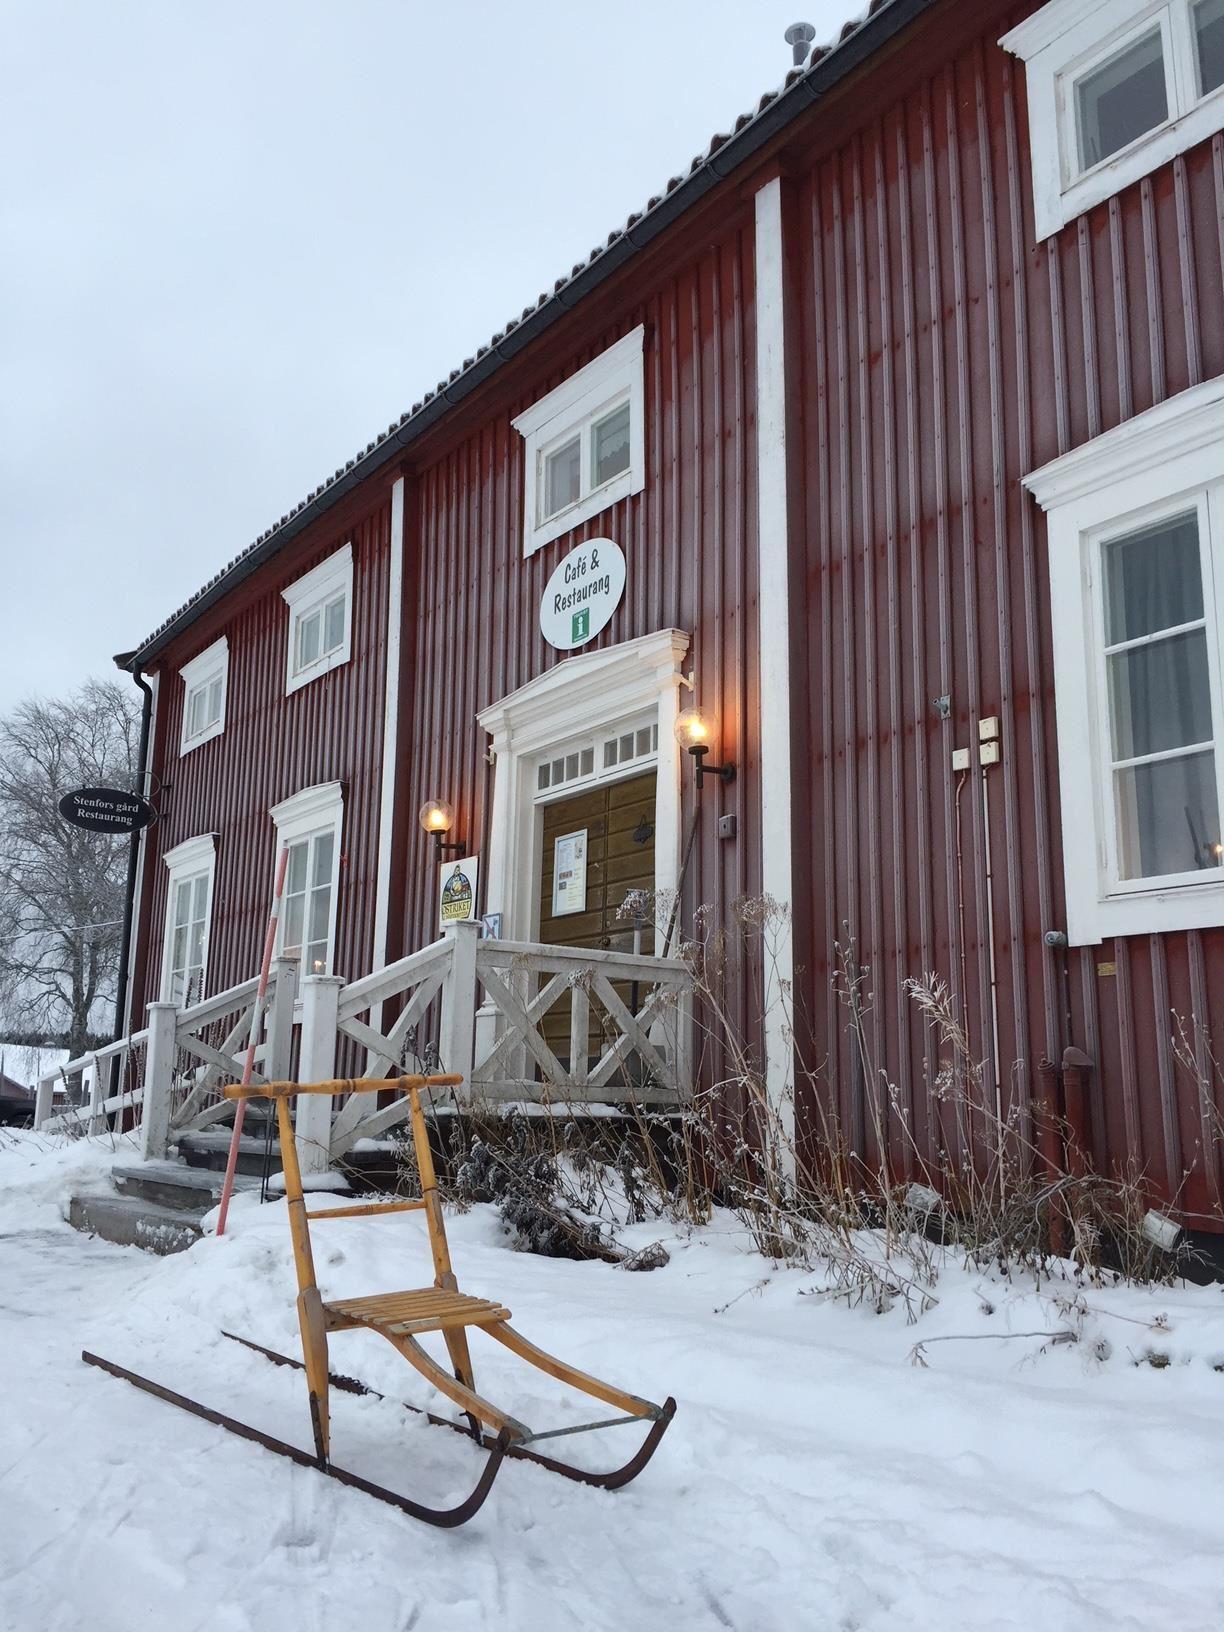 Stenfors Gård (Farmstead gardens)